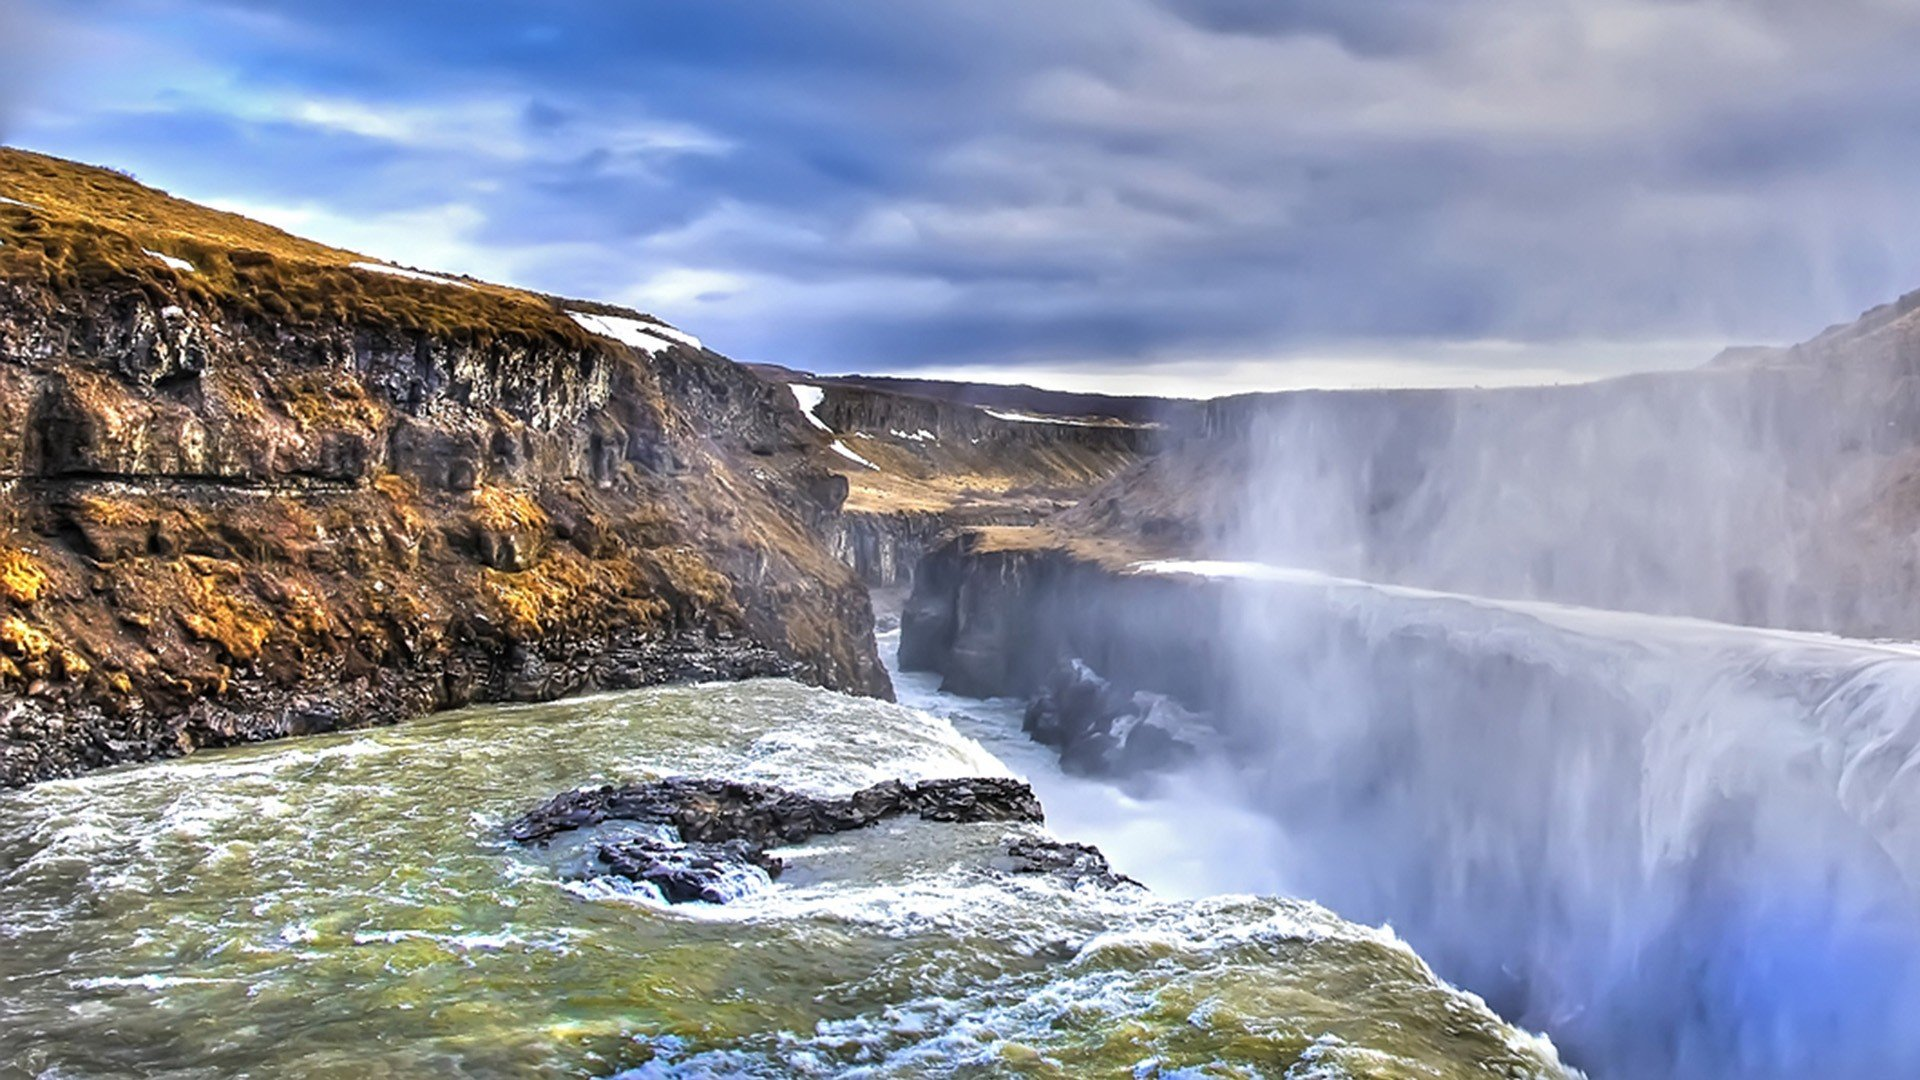 Falling Water Hd Wallpaper Water Iceland Gullfoss Falling Wallpaper 1920x1080